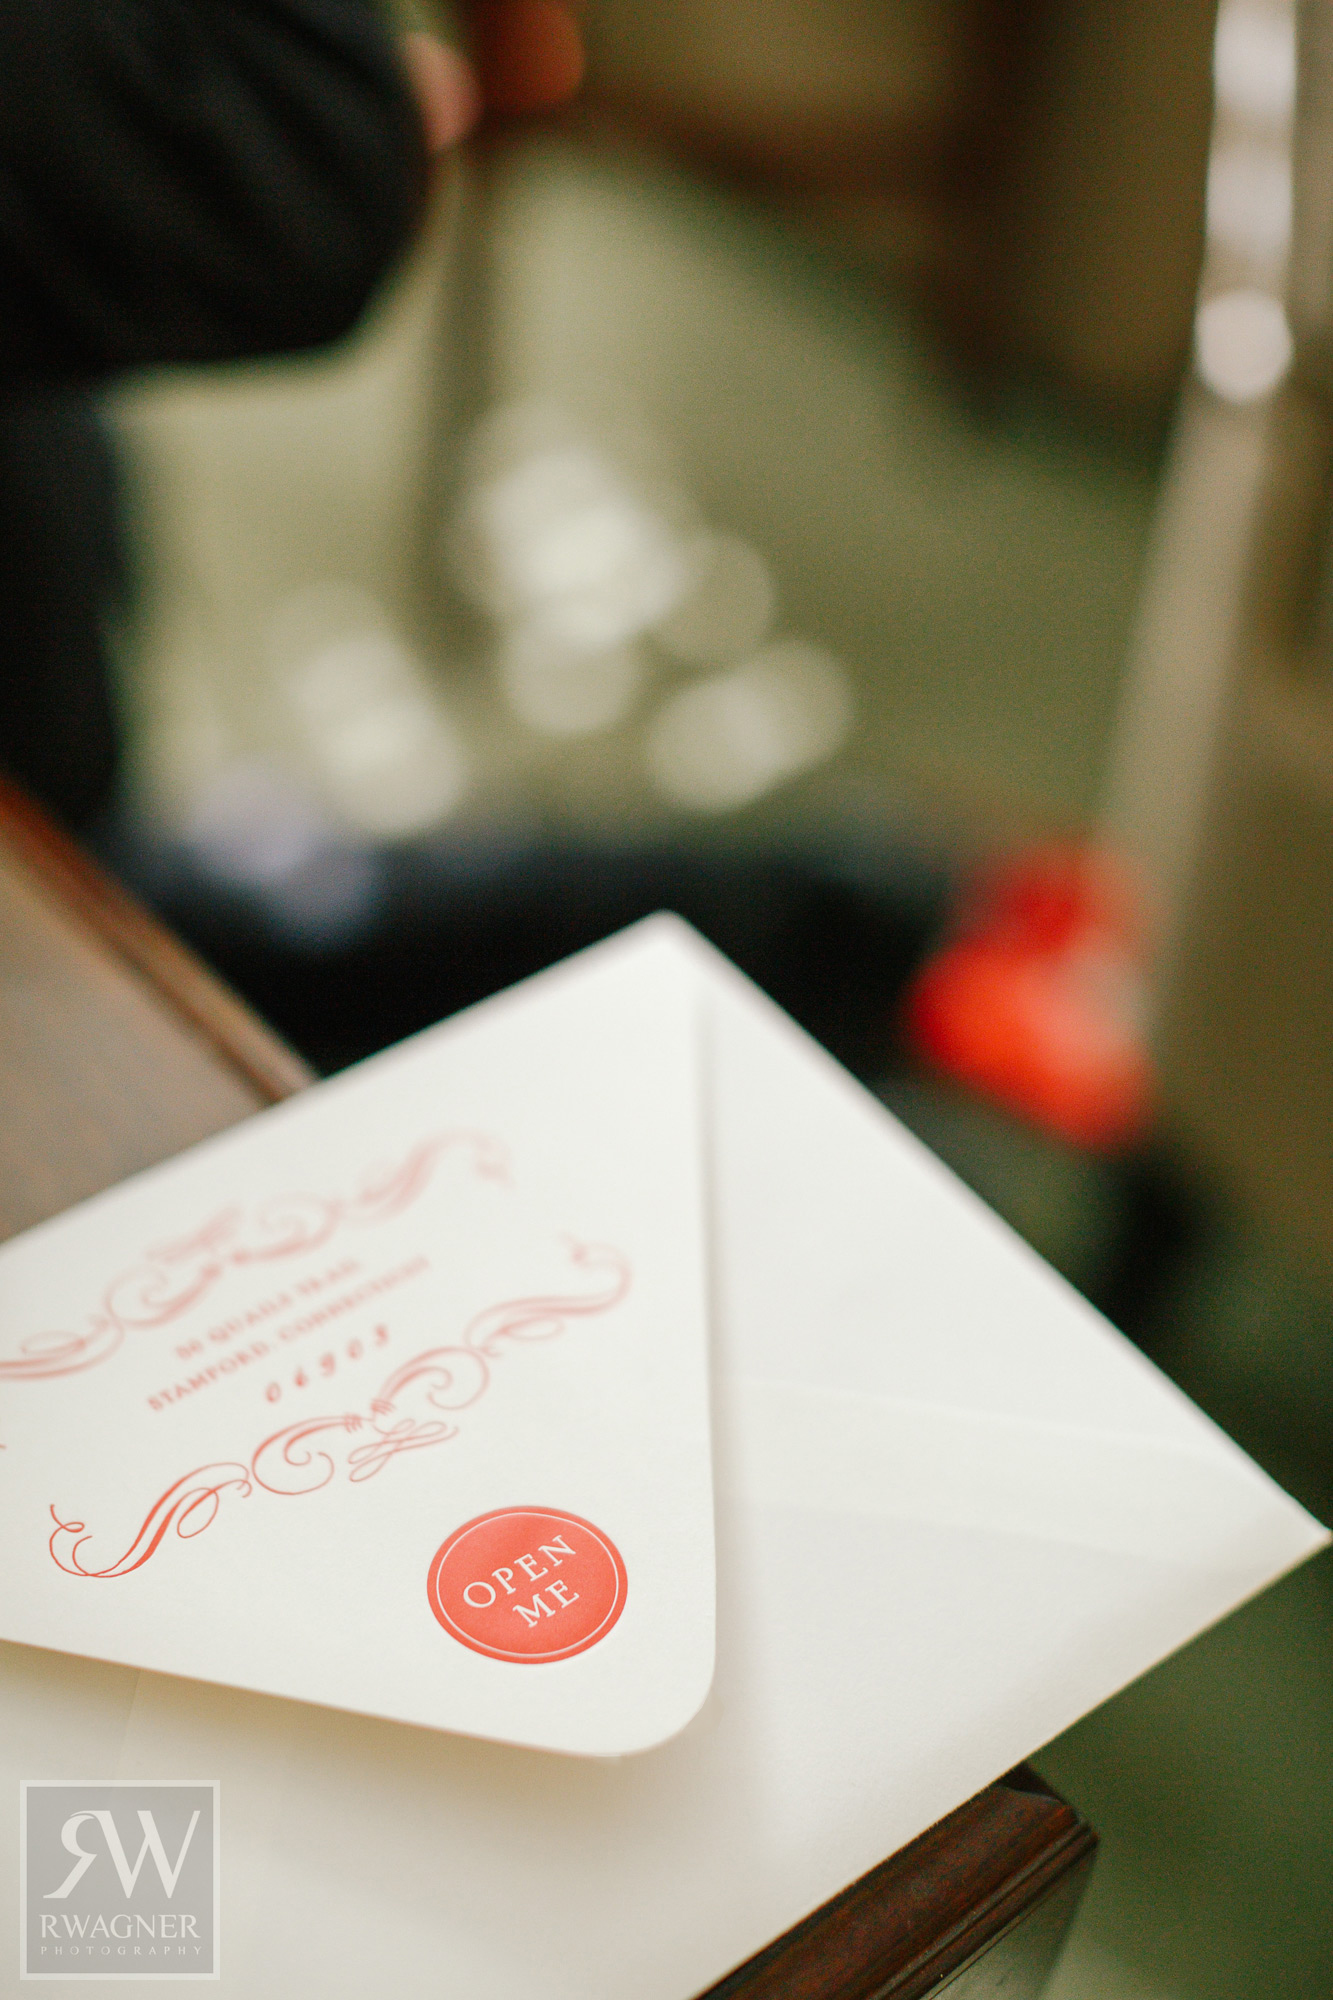 ceci_new_york_luxury_wedding_invitations_couture_red_black_white_real_wedding_dramatic_inn_at_longshore_v286_2.jpg